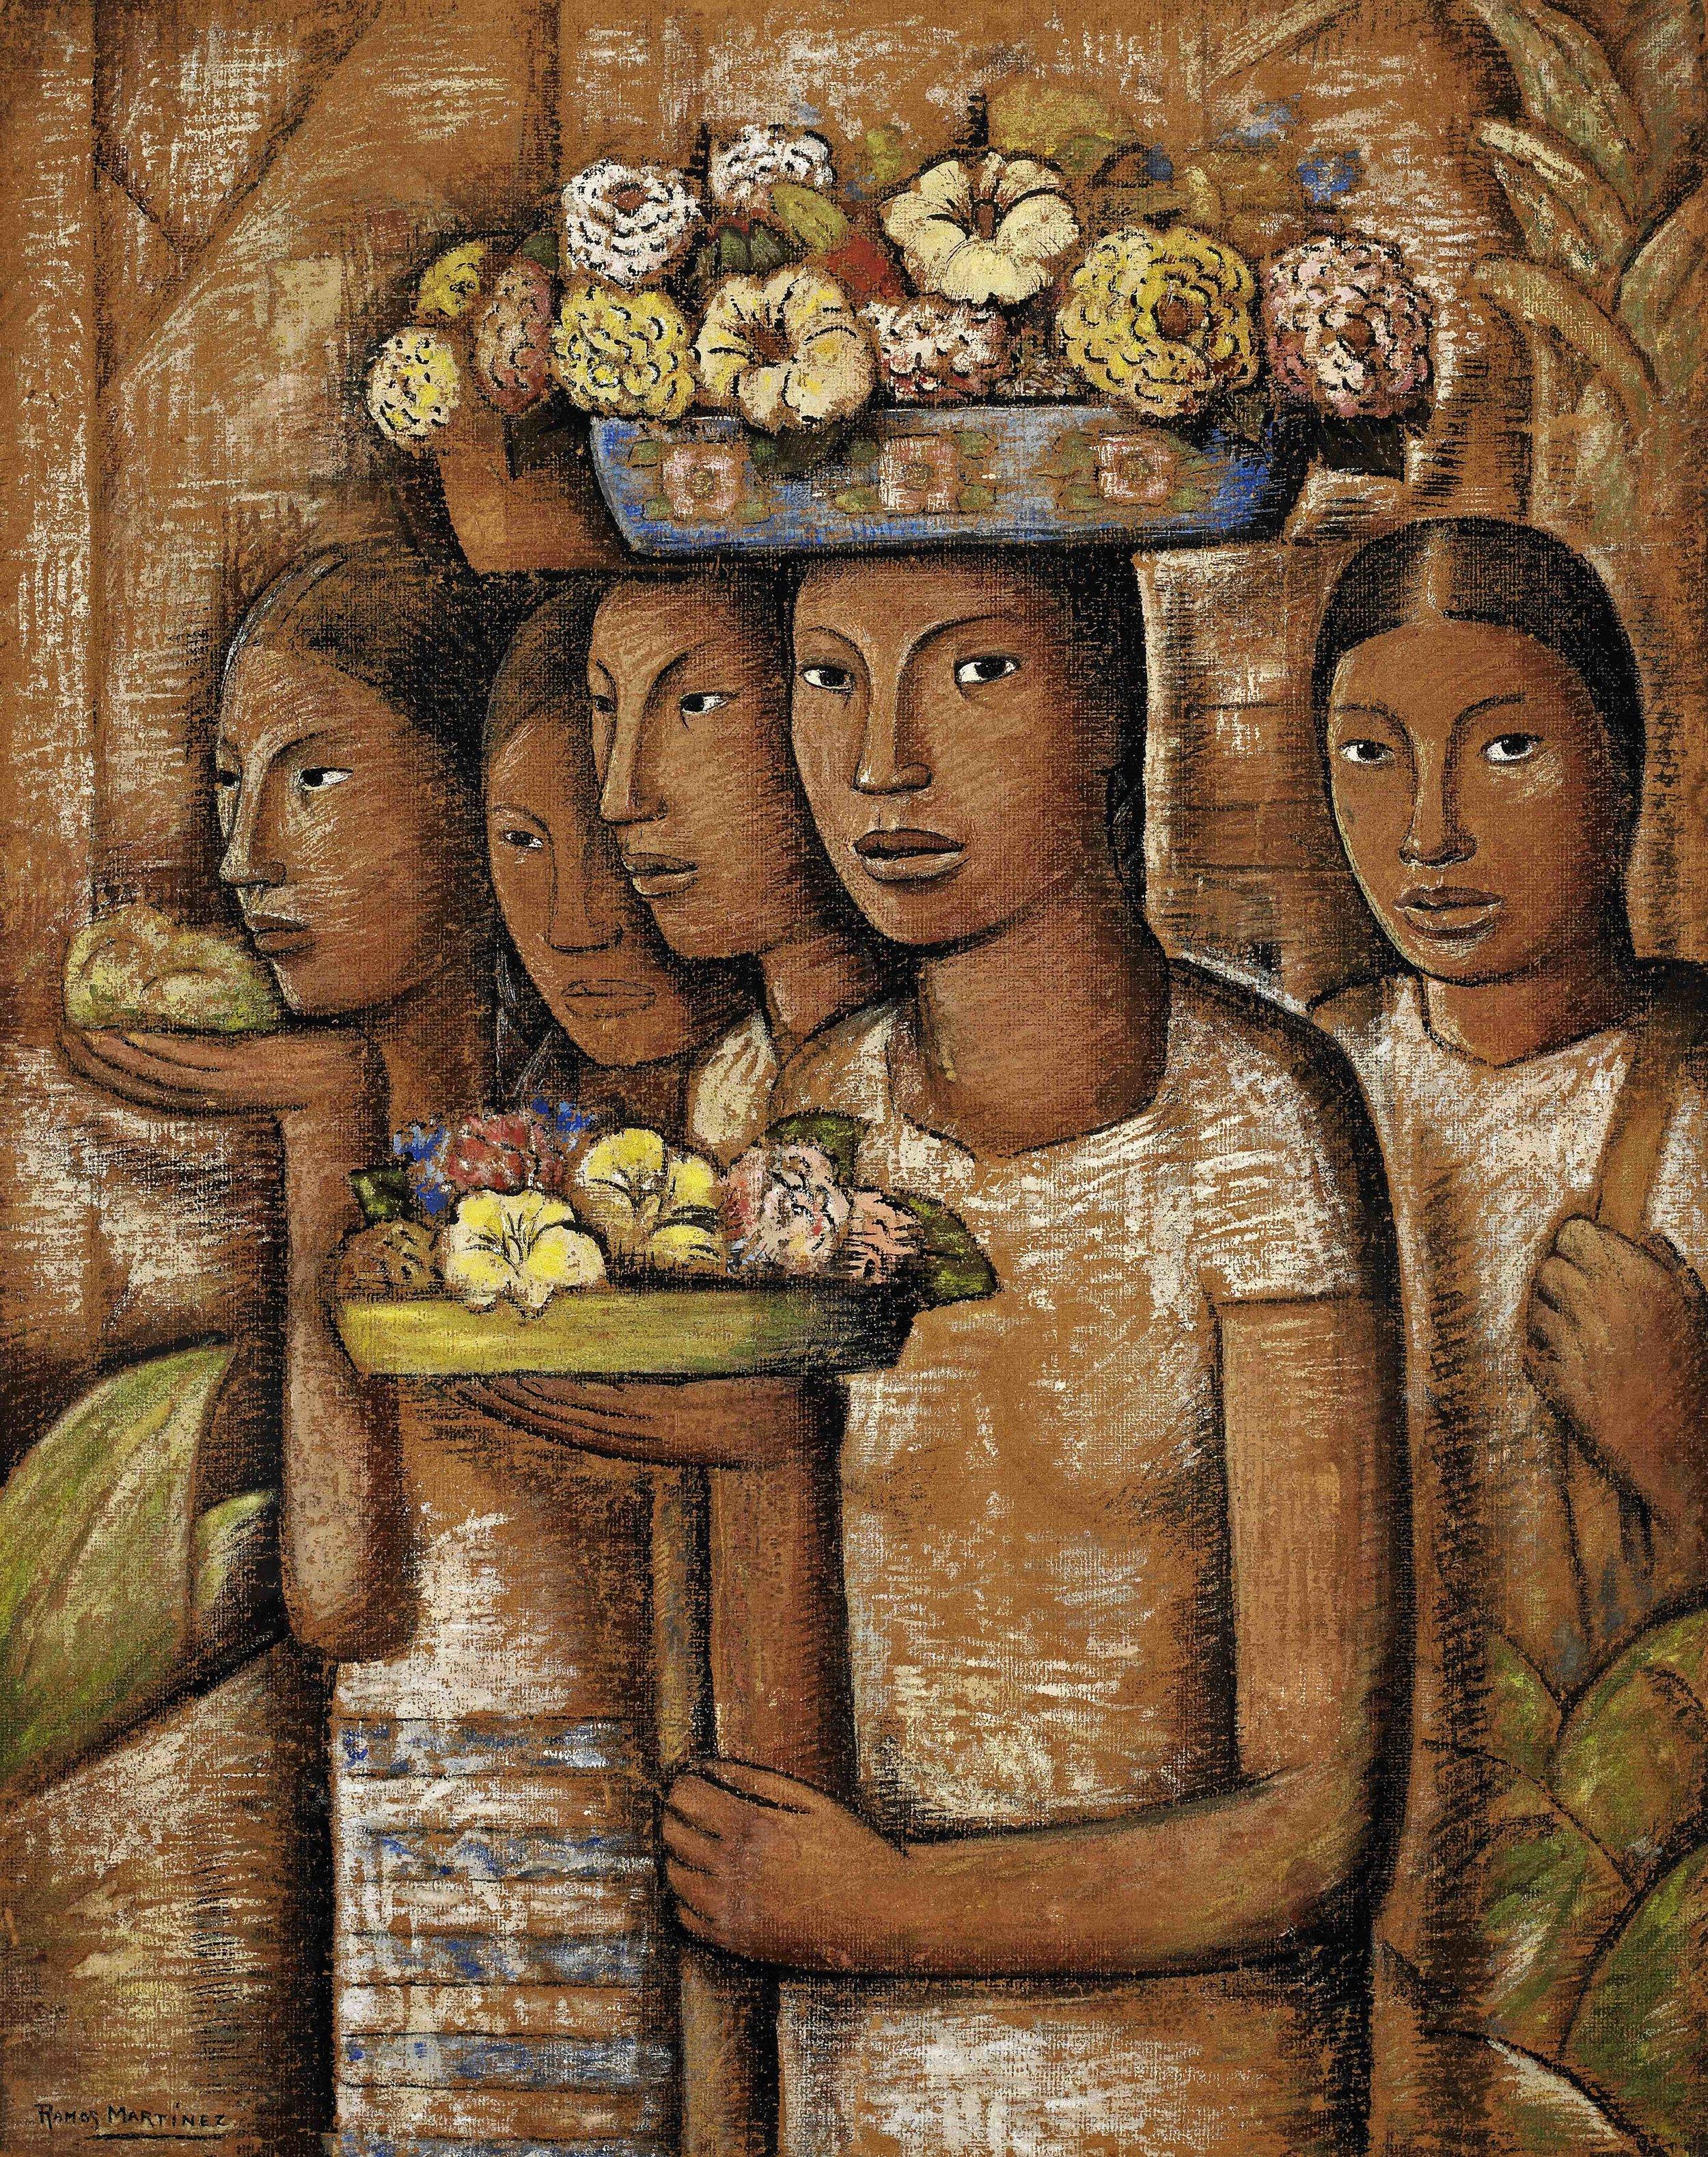 Mujeres Indígenas de Oaxaca / Native Women from Oaxaca  1944 oil on board / óleo sobre tabla 44.8 x 35.5 inches; 113.7 x 90.2 centímetros